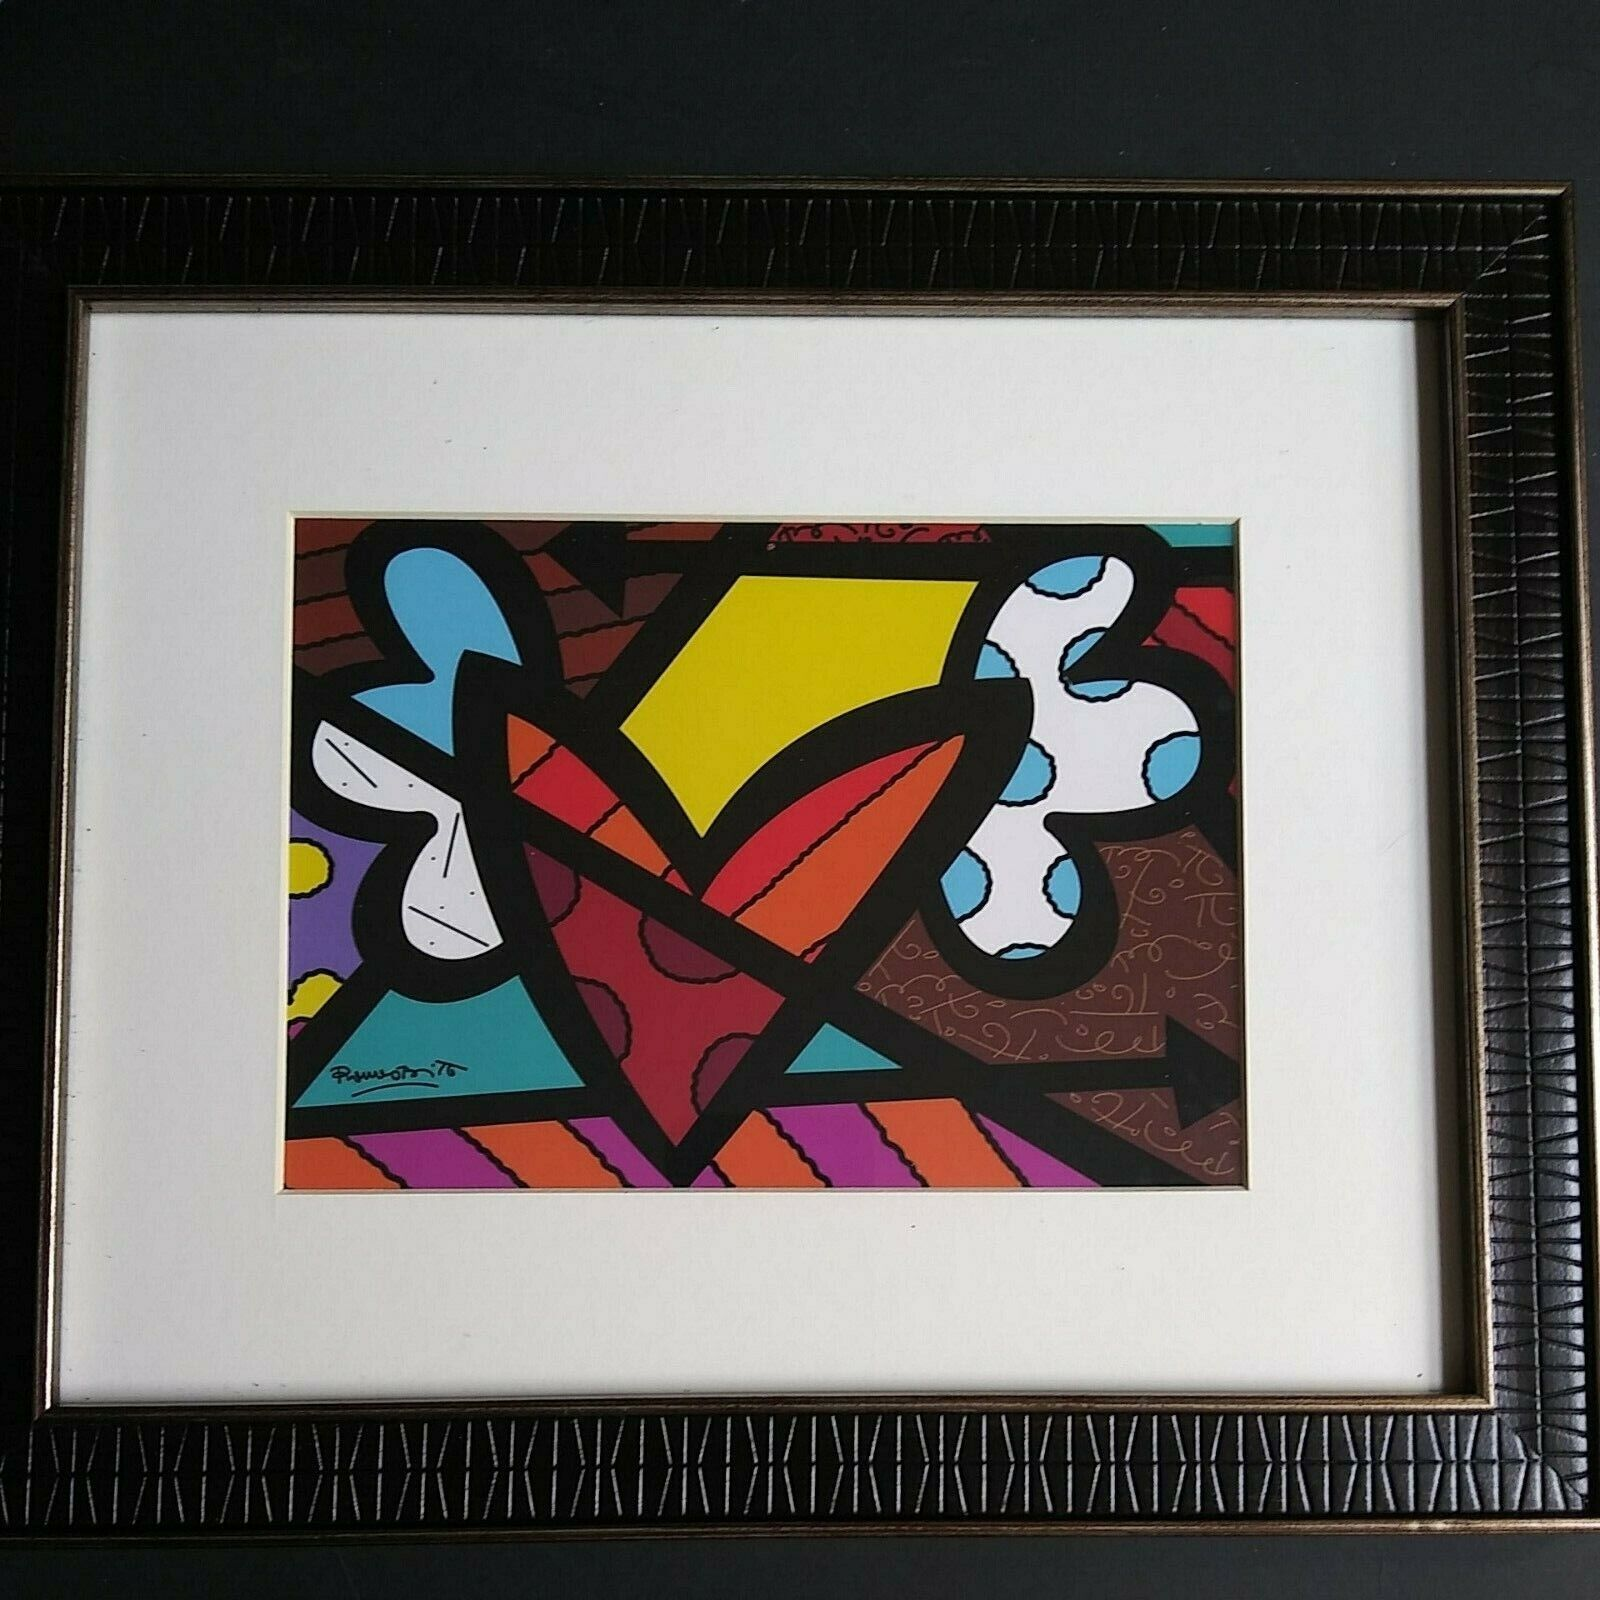 Romero Britto Free Love Pop Art Framed - $23.00